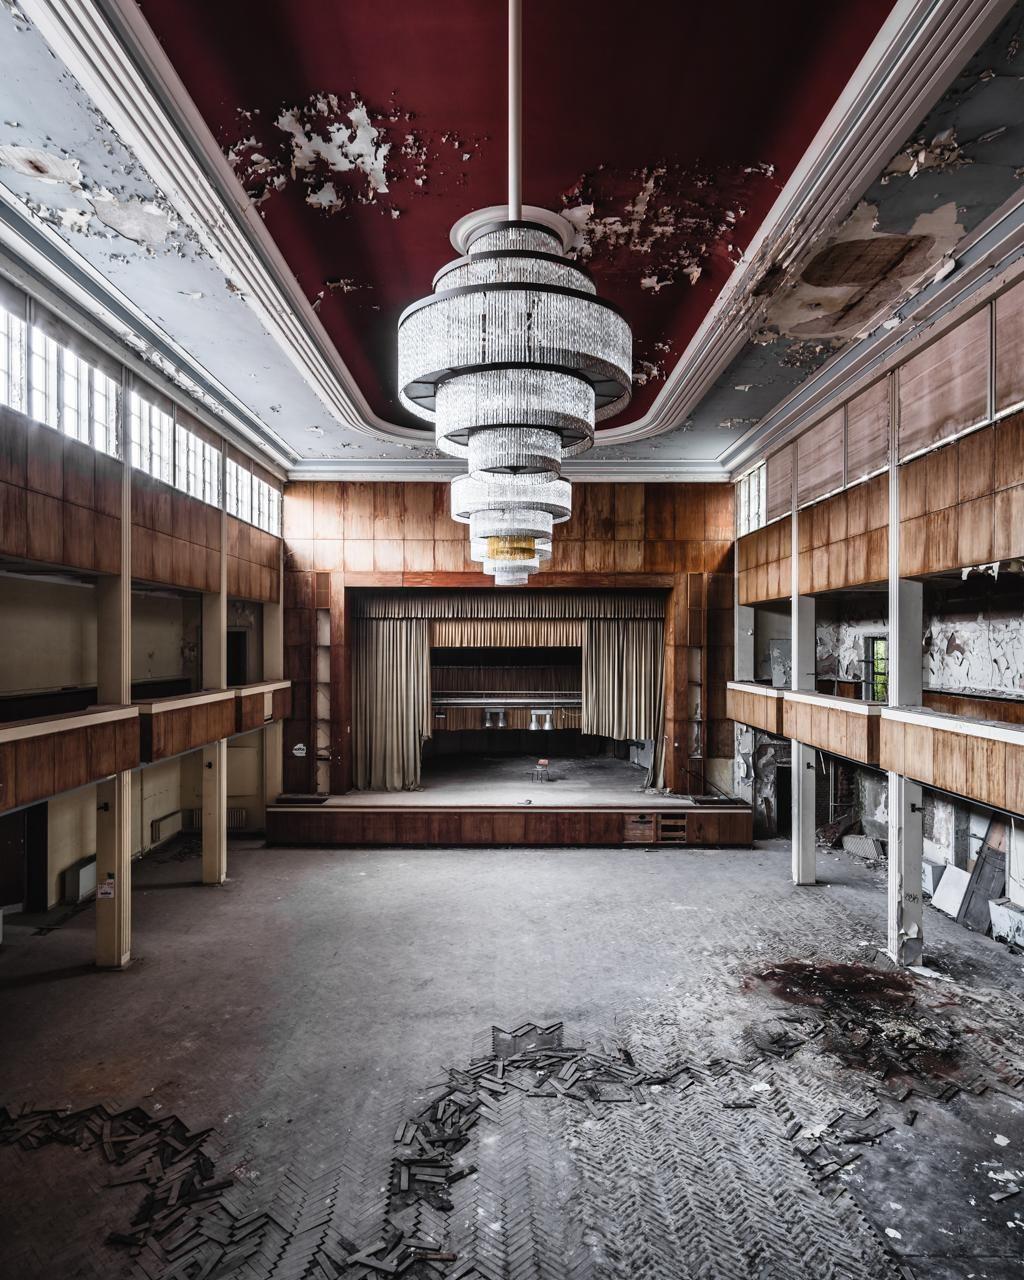 Ballroom Of Abandoned Hotel In Germany 1024x1280 Oc